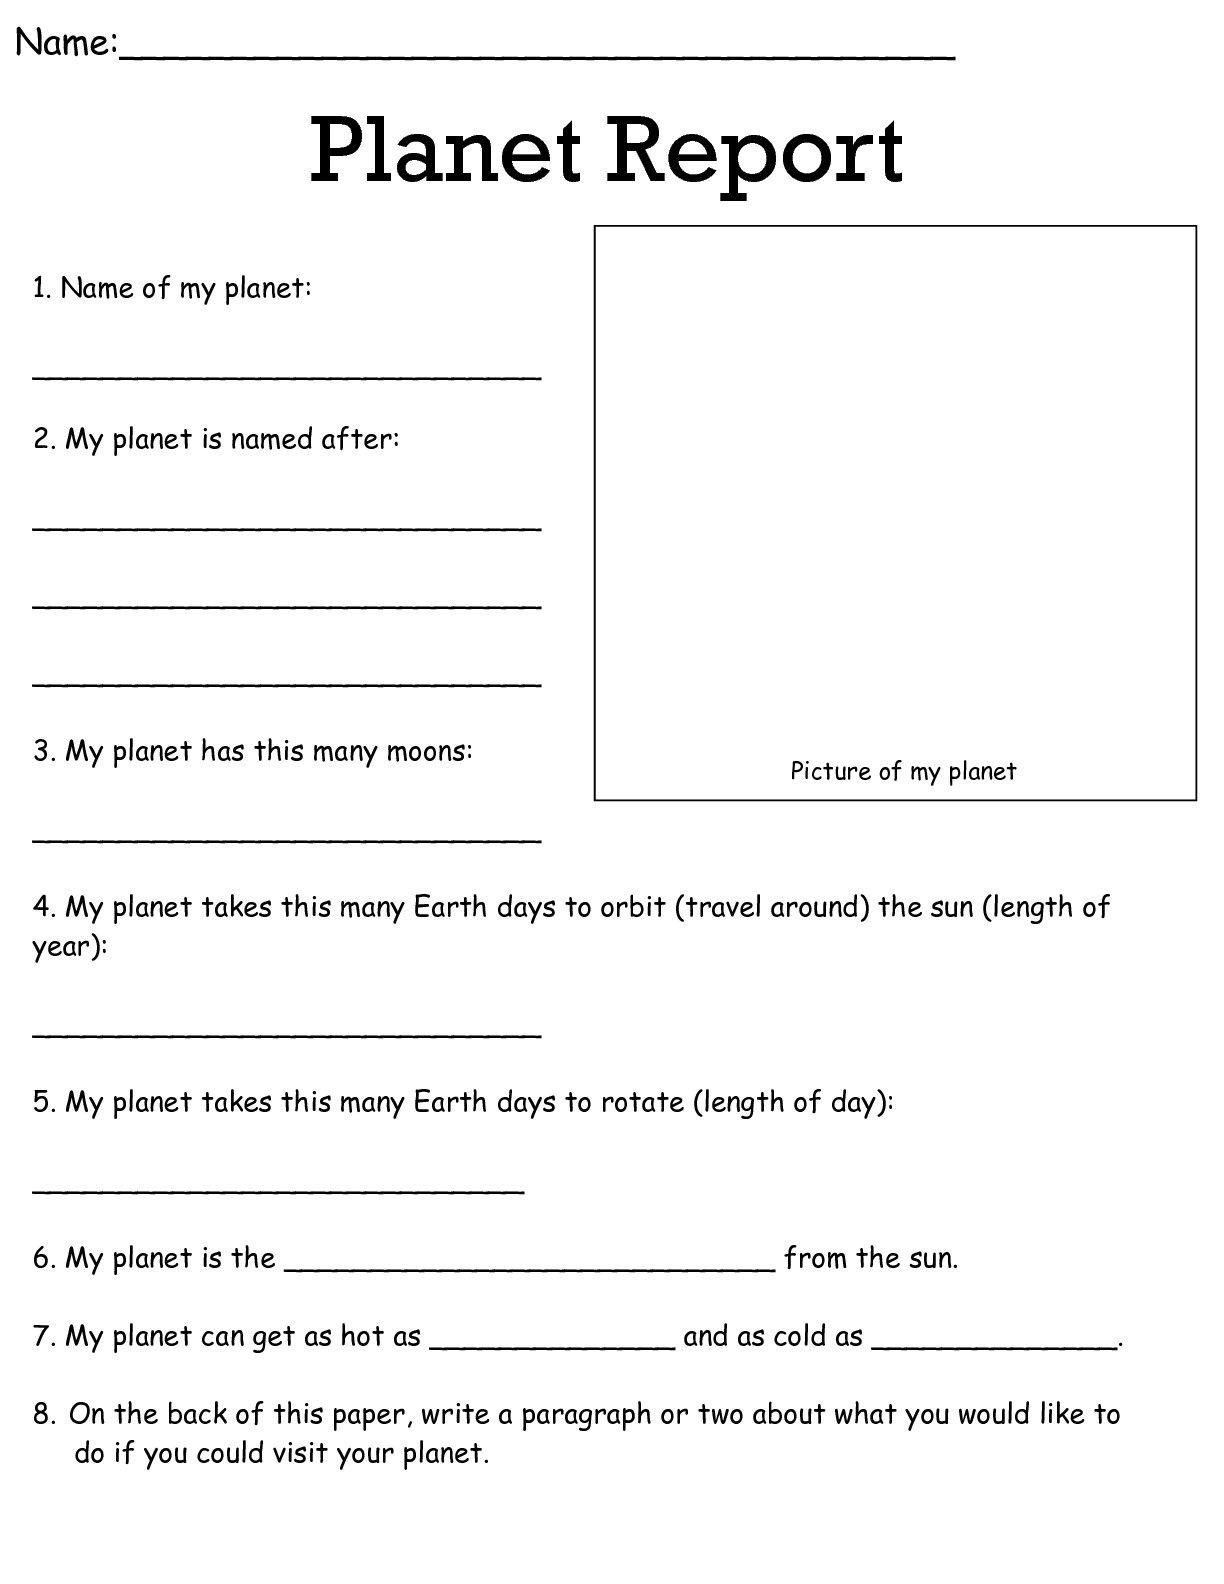 Job Worksheets 5Th &6Th | Science Worksheets Science Worksheets - 6Th Grade Writing Worksheets Printable Free